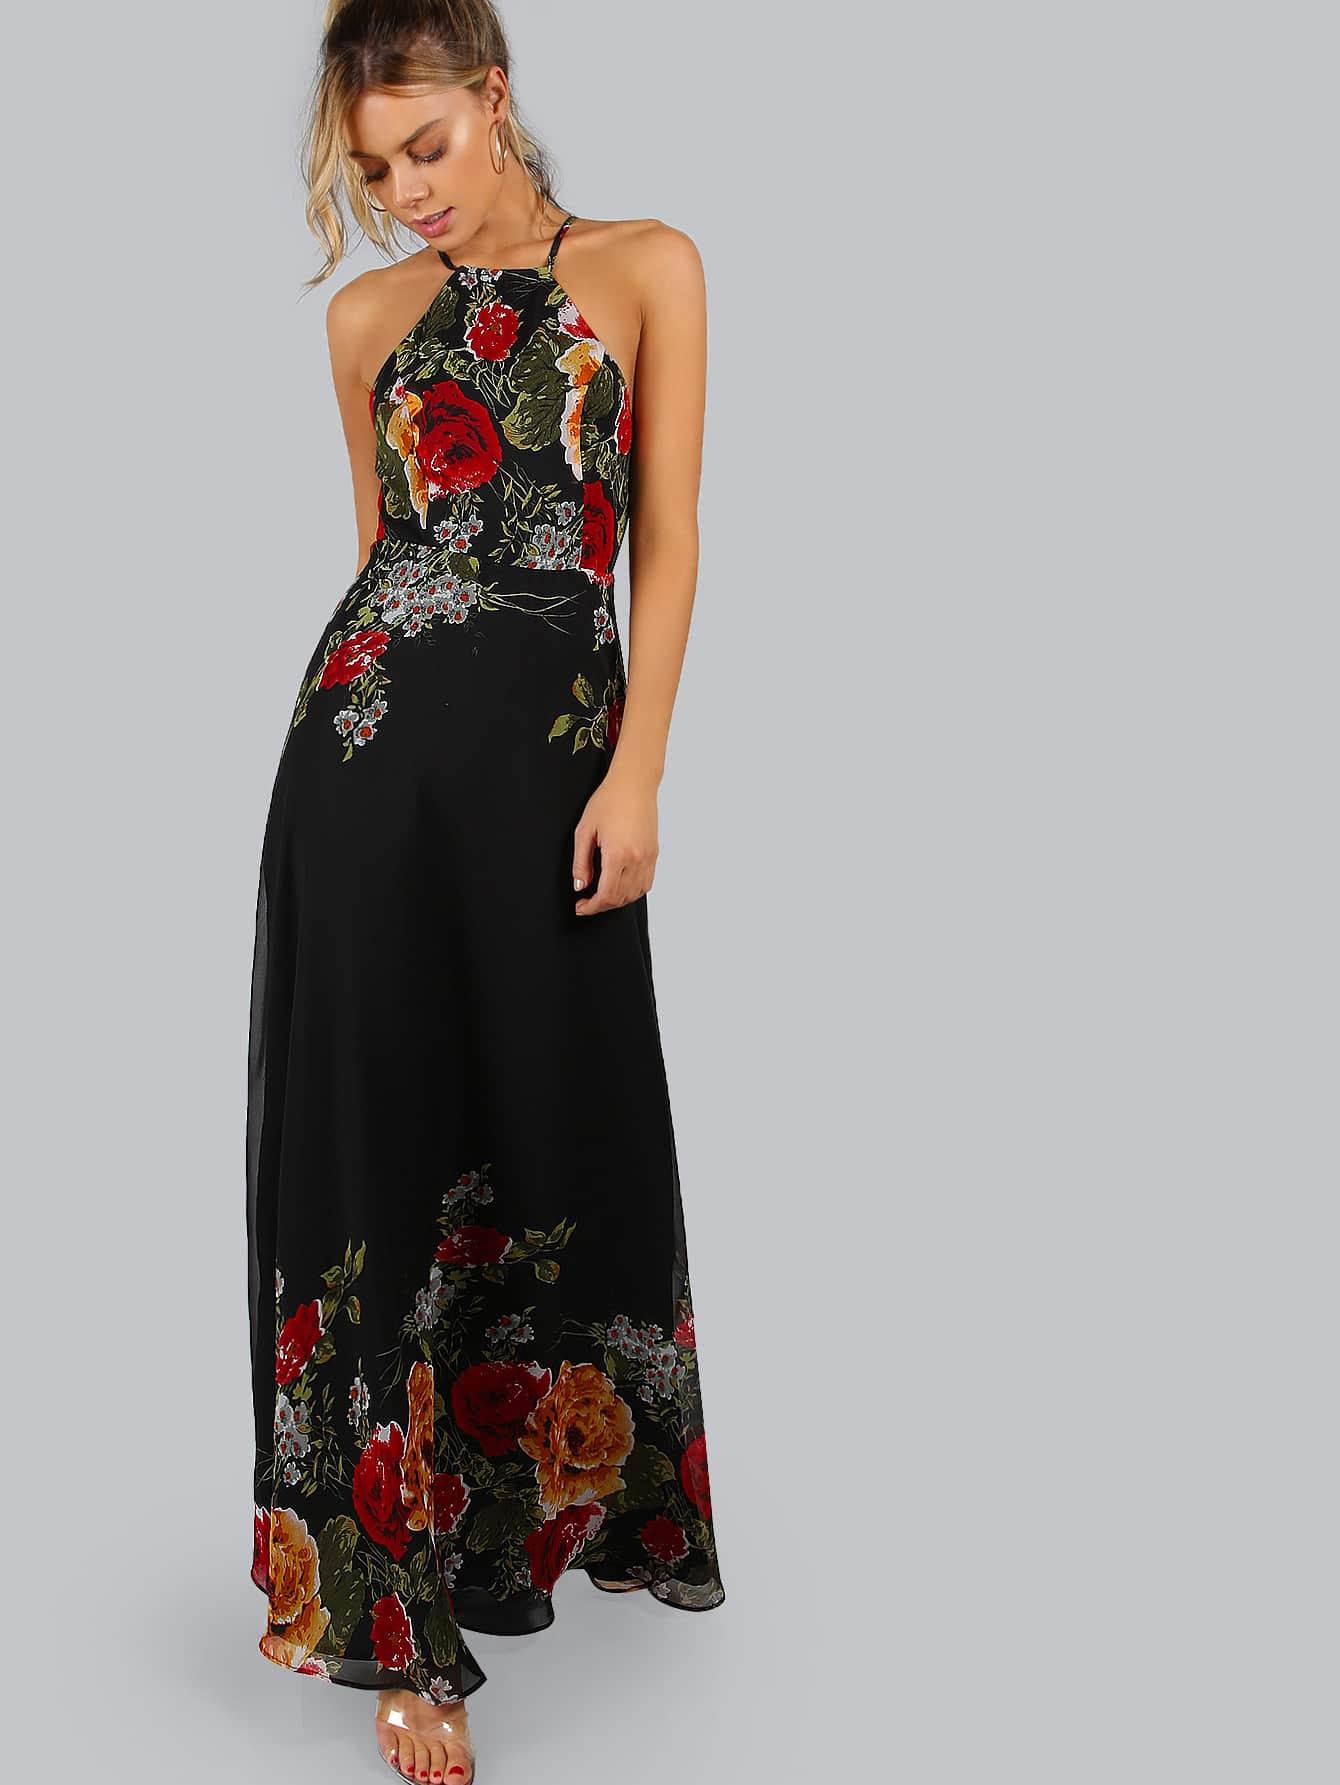 dressmmc170227701_1